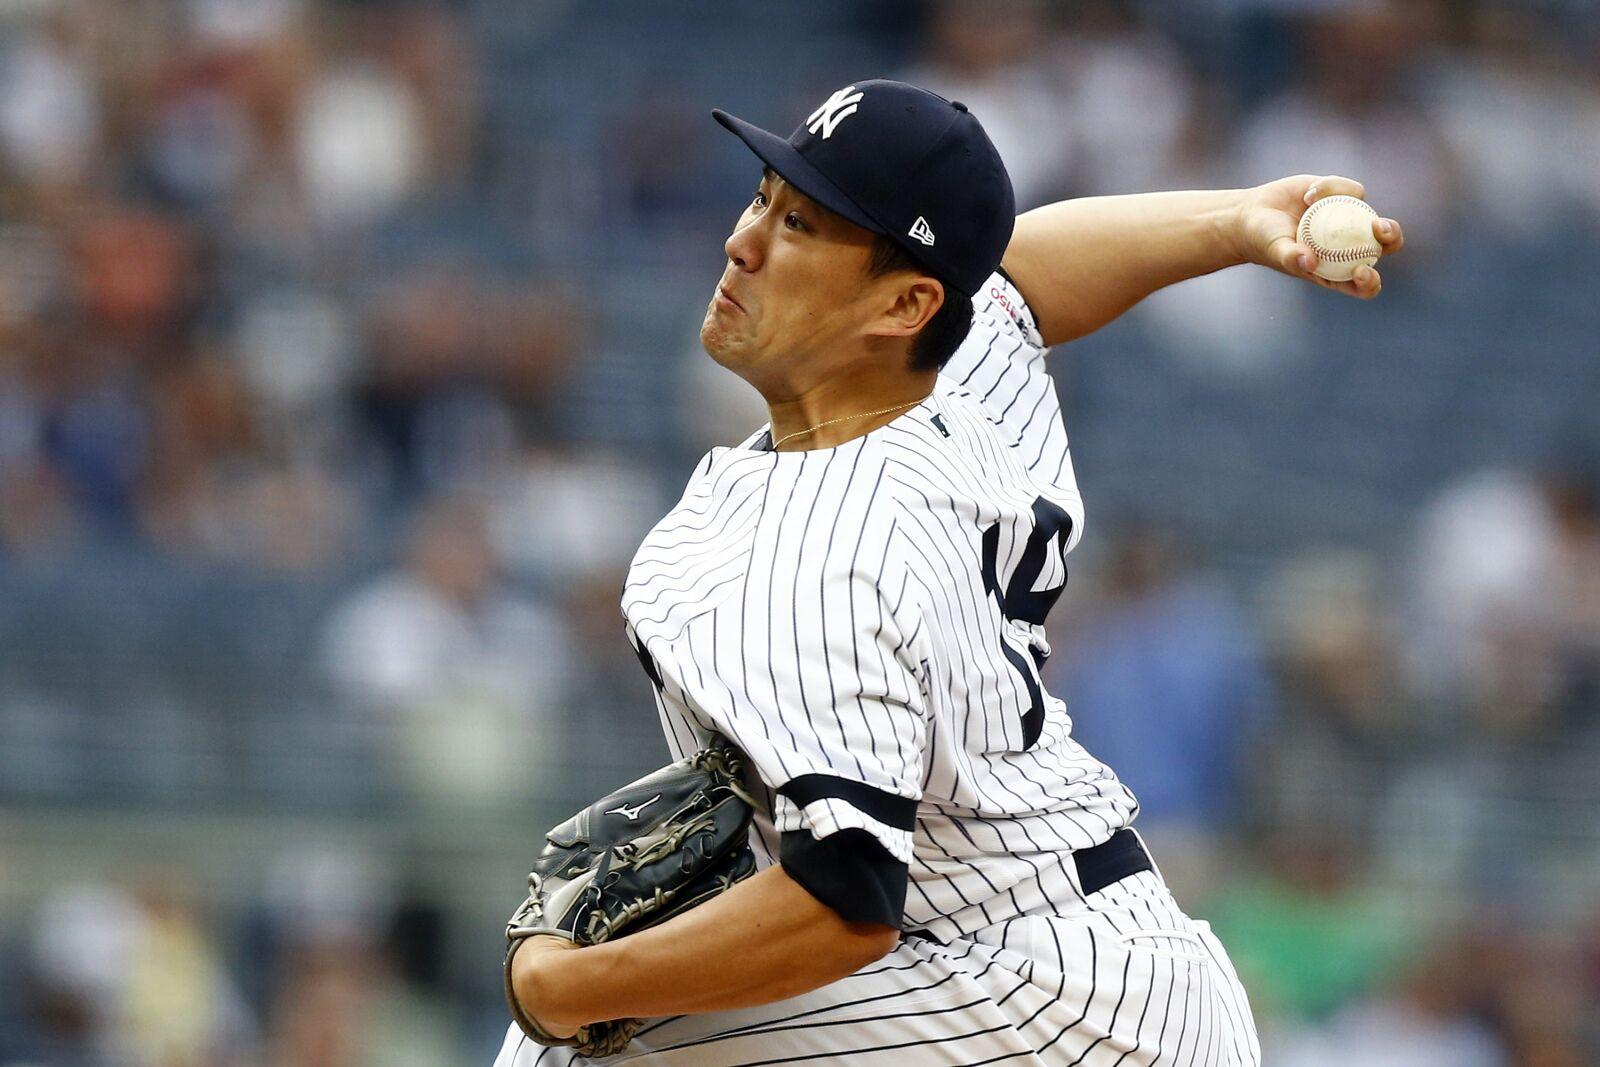 Yankees: Masahiro Tanaka Shines With Fourth Career Shutout Against Rays